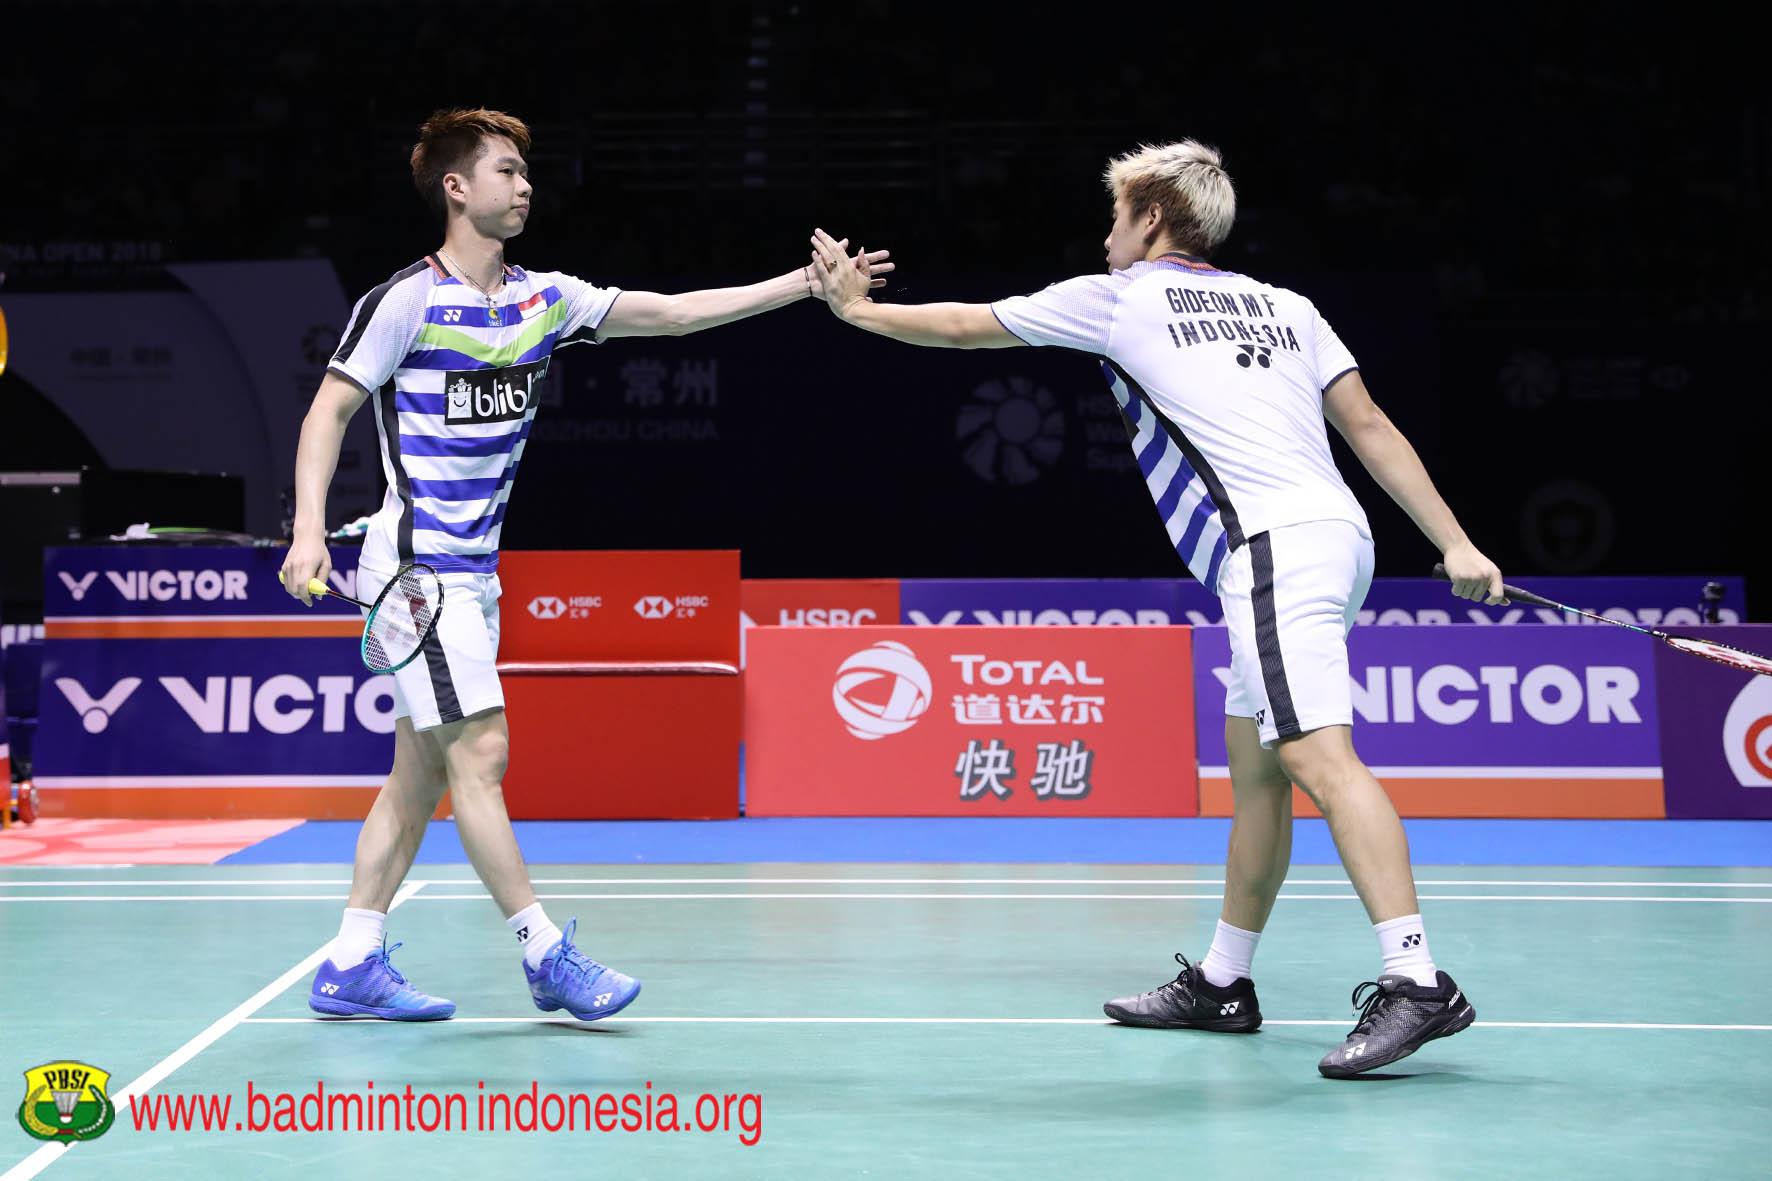 https: img-o.okeinfo.net content 2018 11 09 40 1975794 marcus-kevin-dan-ahsan-hendra-lolos-ke-semifinal-china-open-2018-X6REaOvOtc.jpg